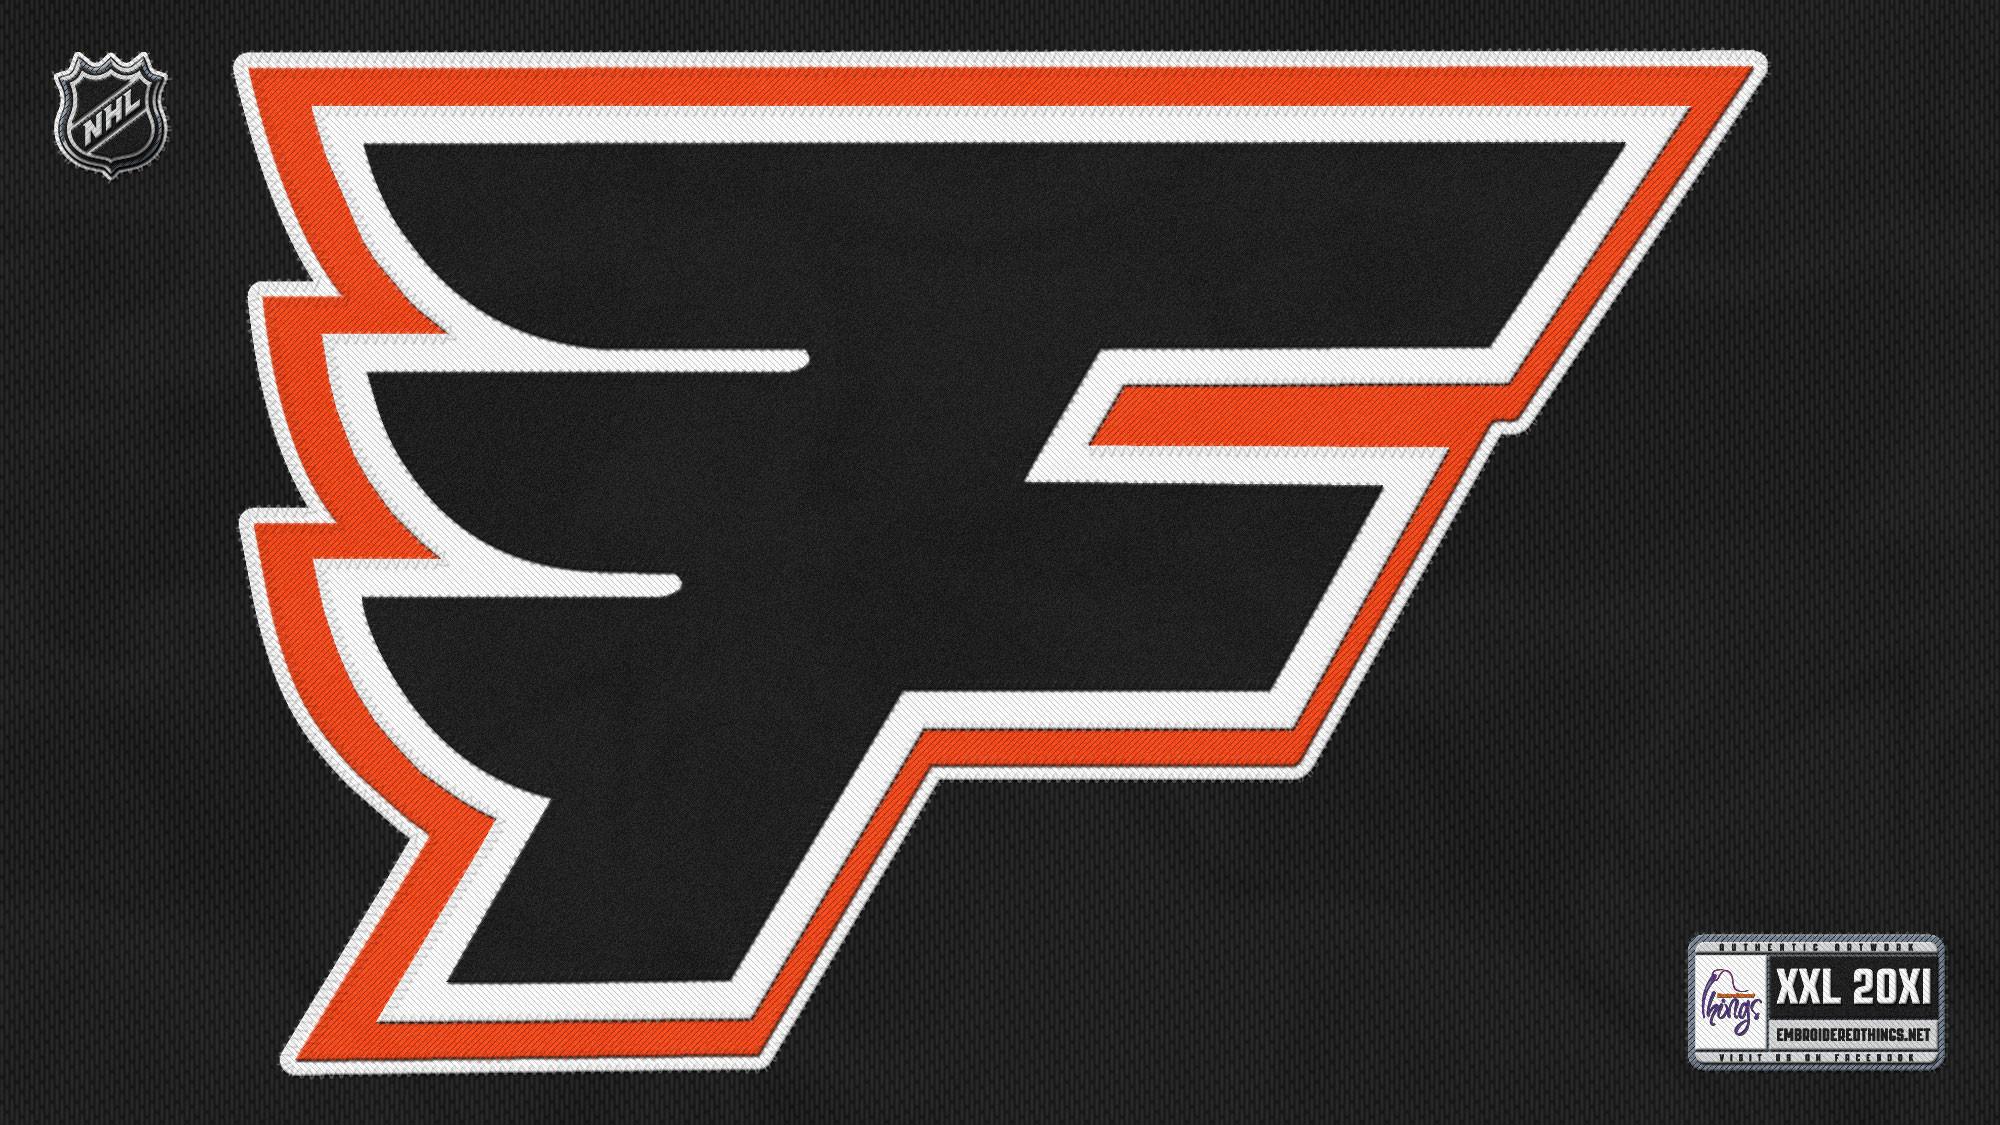 NHL Philadelphia Flyers Logo Black wallpaper HD. Free desktop .